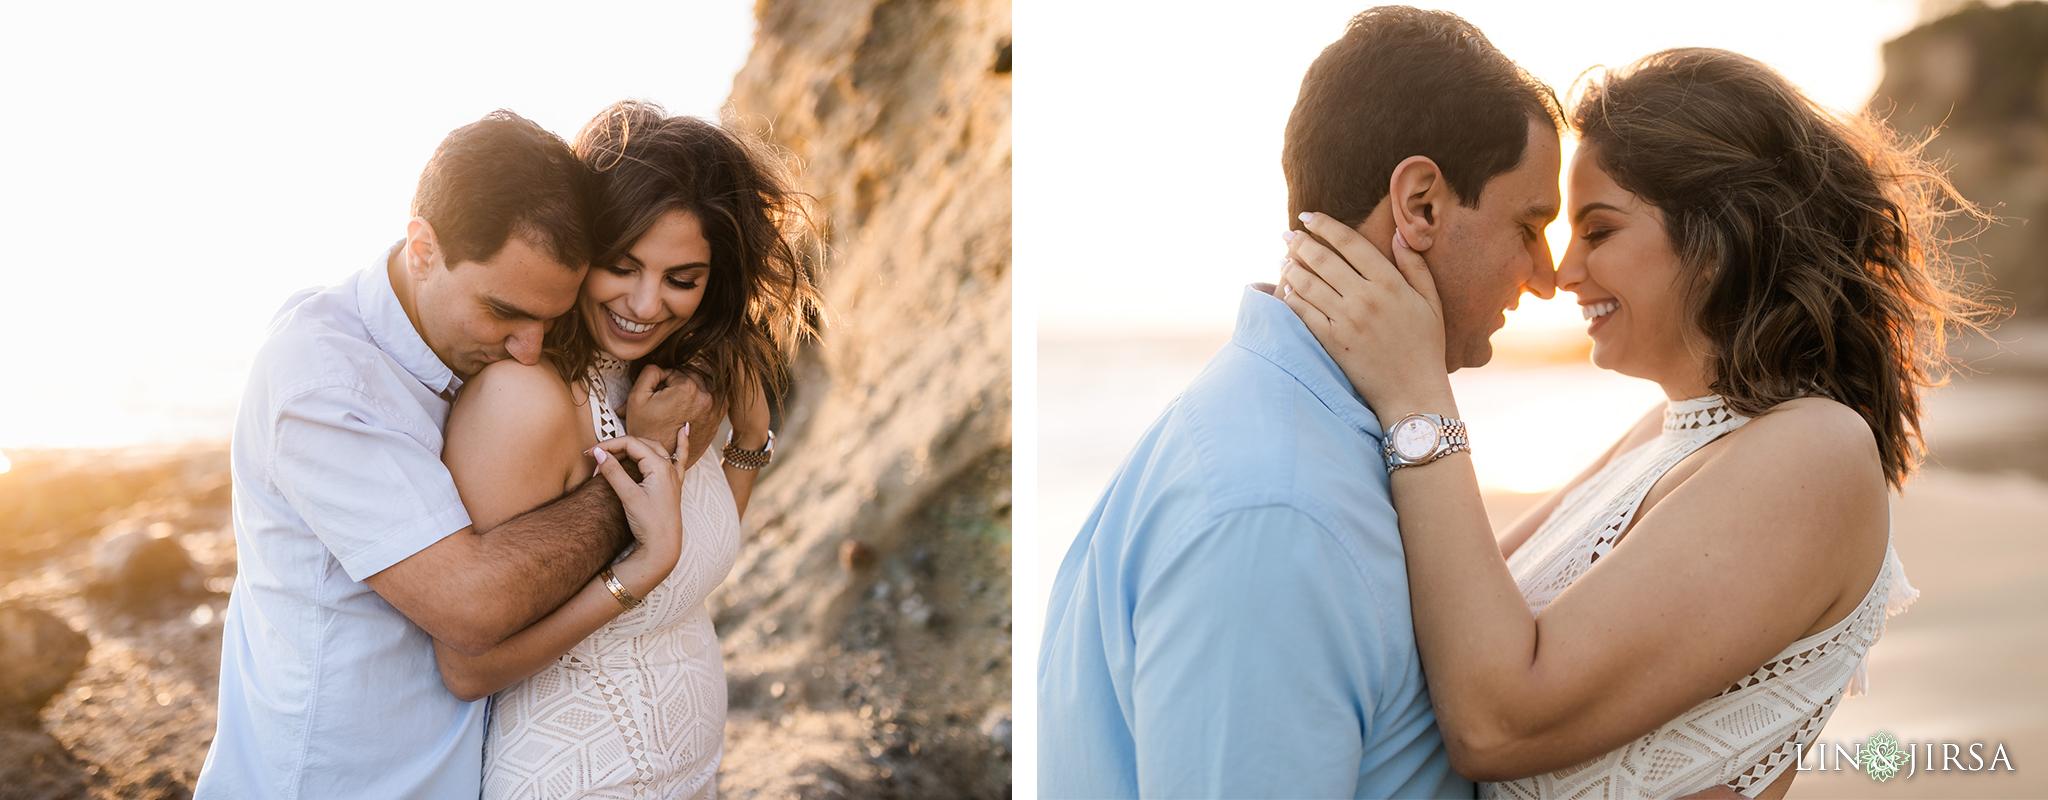 13 Orange County Sunset Beach Engagement Photography